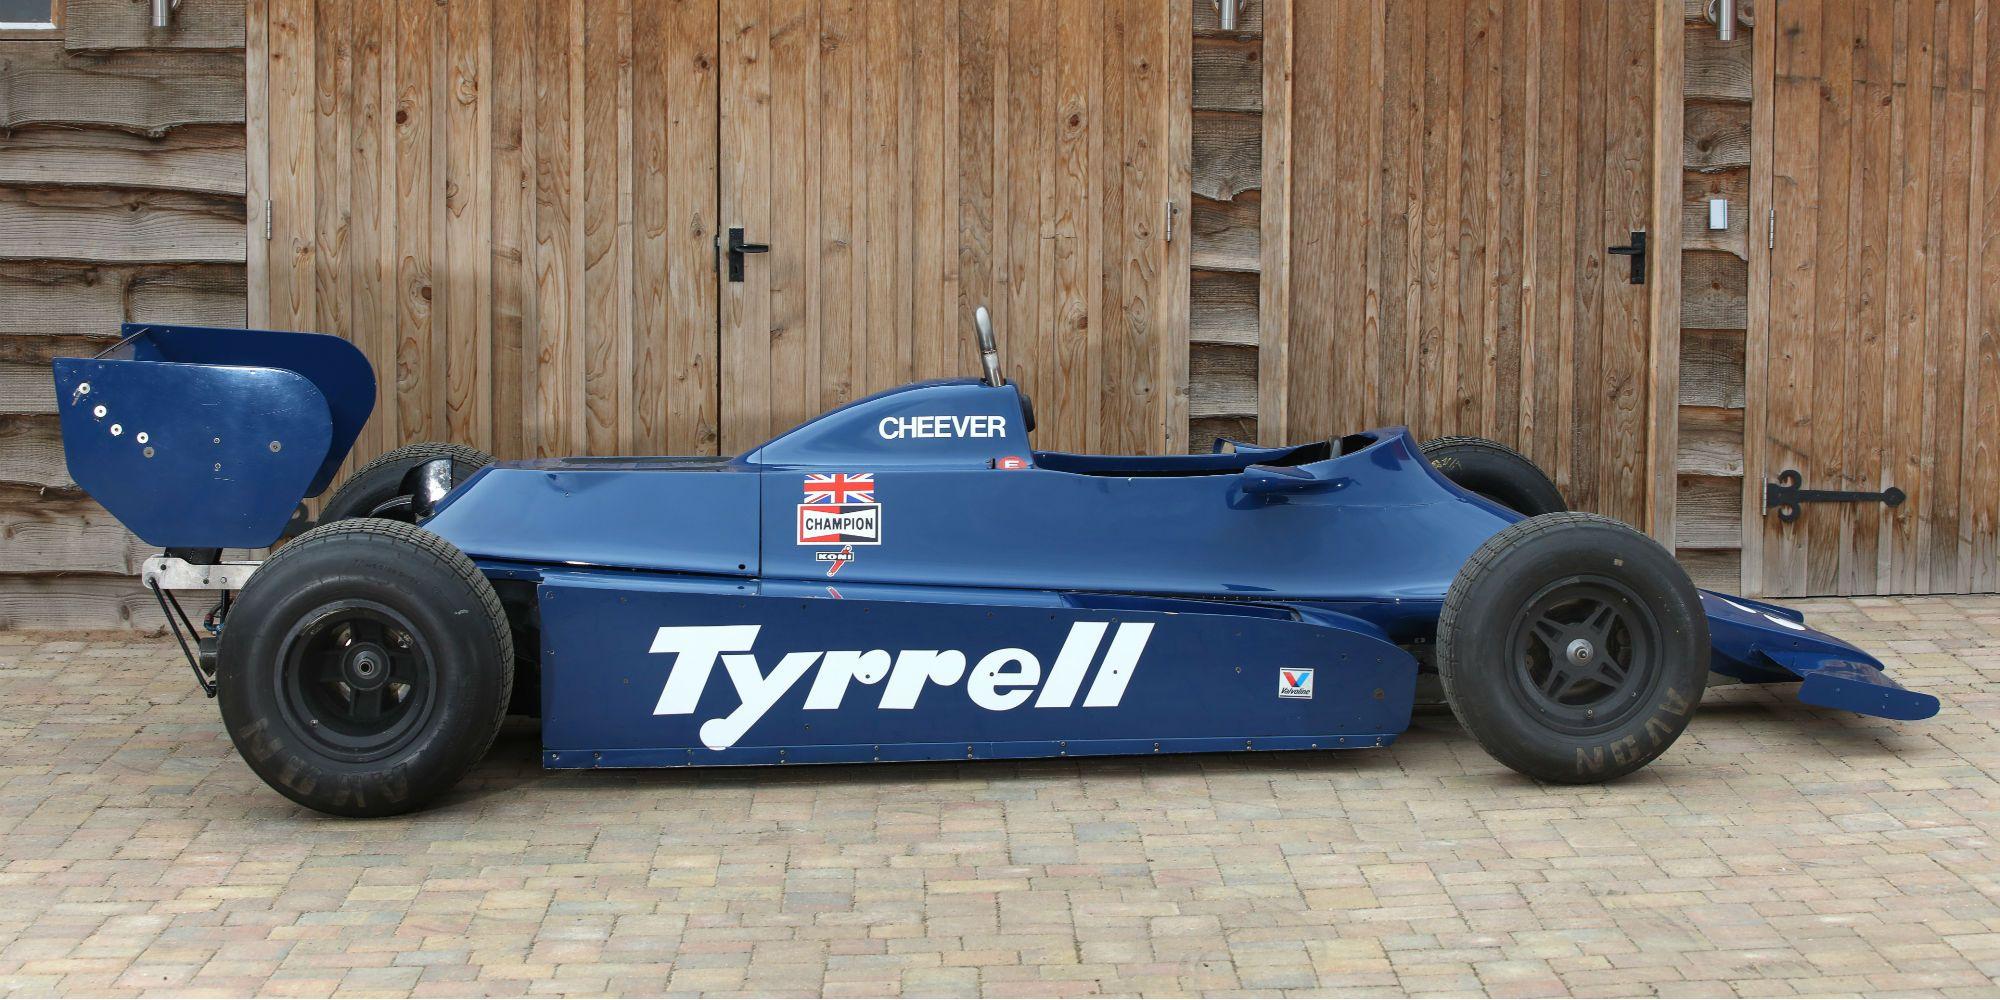 tyrrell 010 formula 1 1980 ex daly cheever 225 000 building plastic f1 pinterest cars. Black Bedroom Furniture Sets. Home Design Ideas